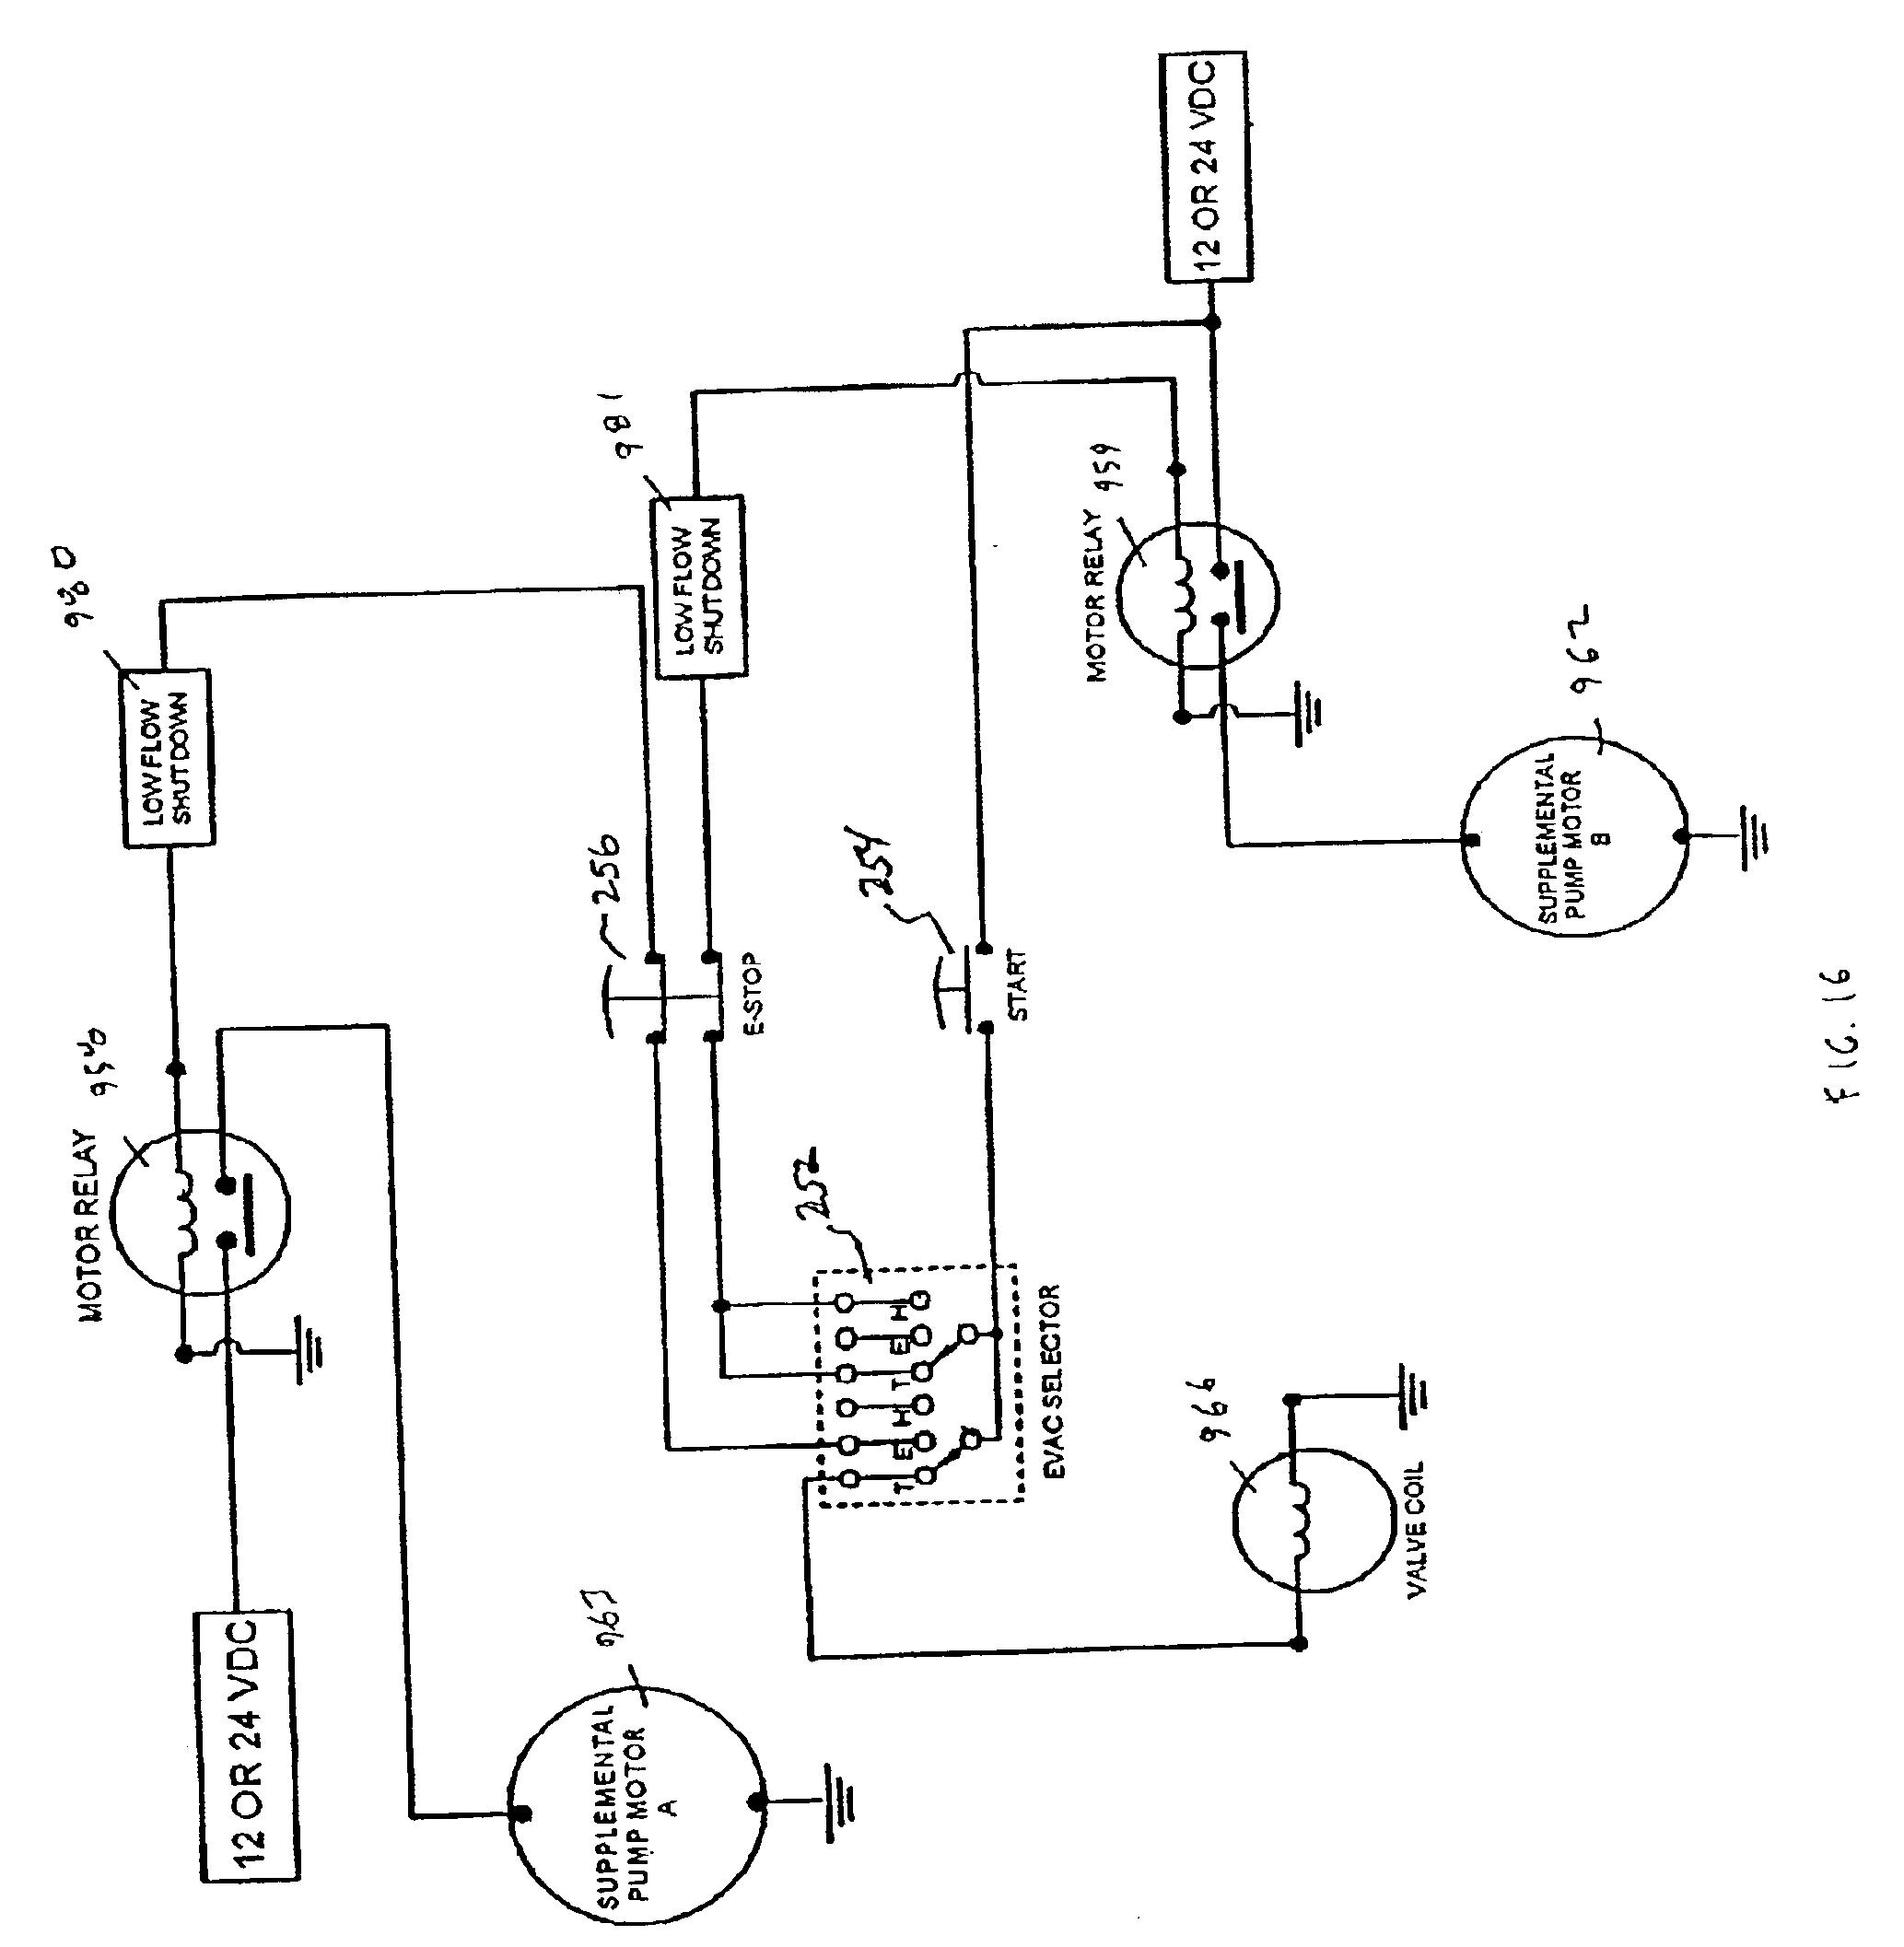 international 7600 wiring diagrams international s1900 wiring diagram wiring diagram